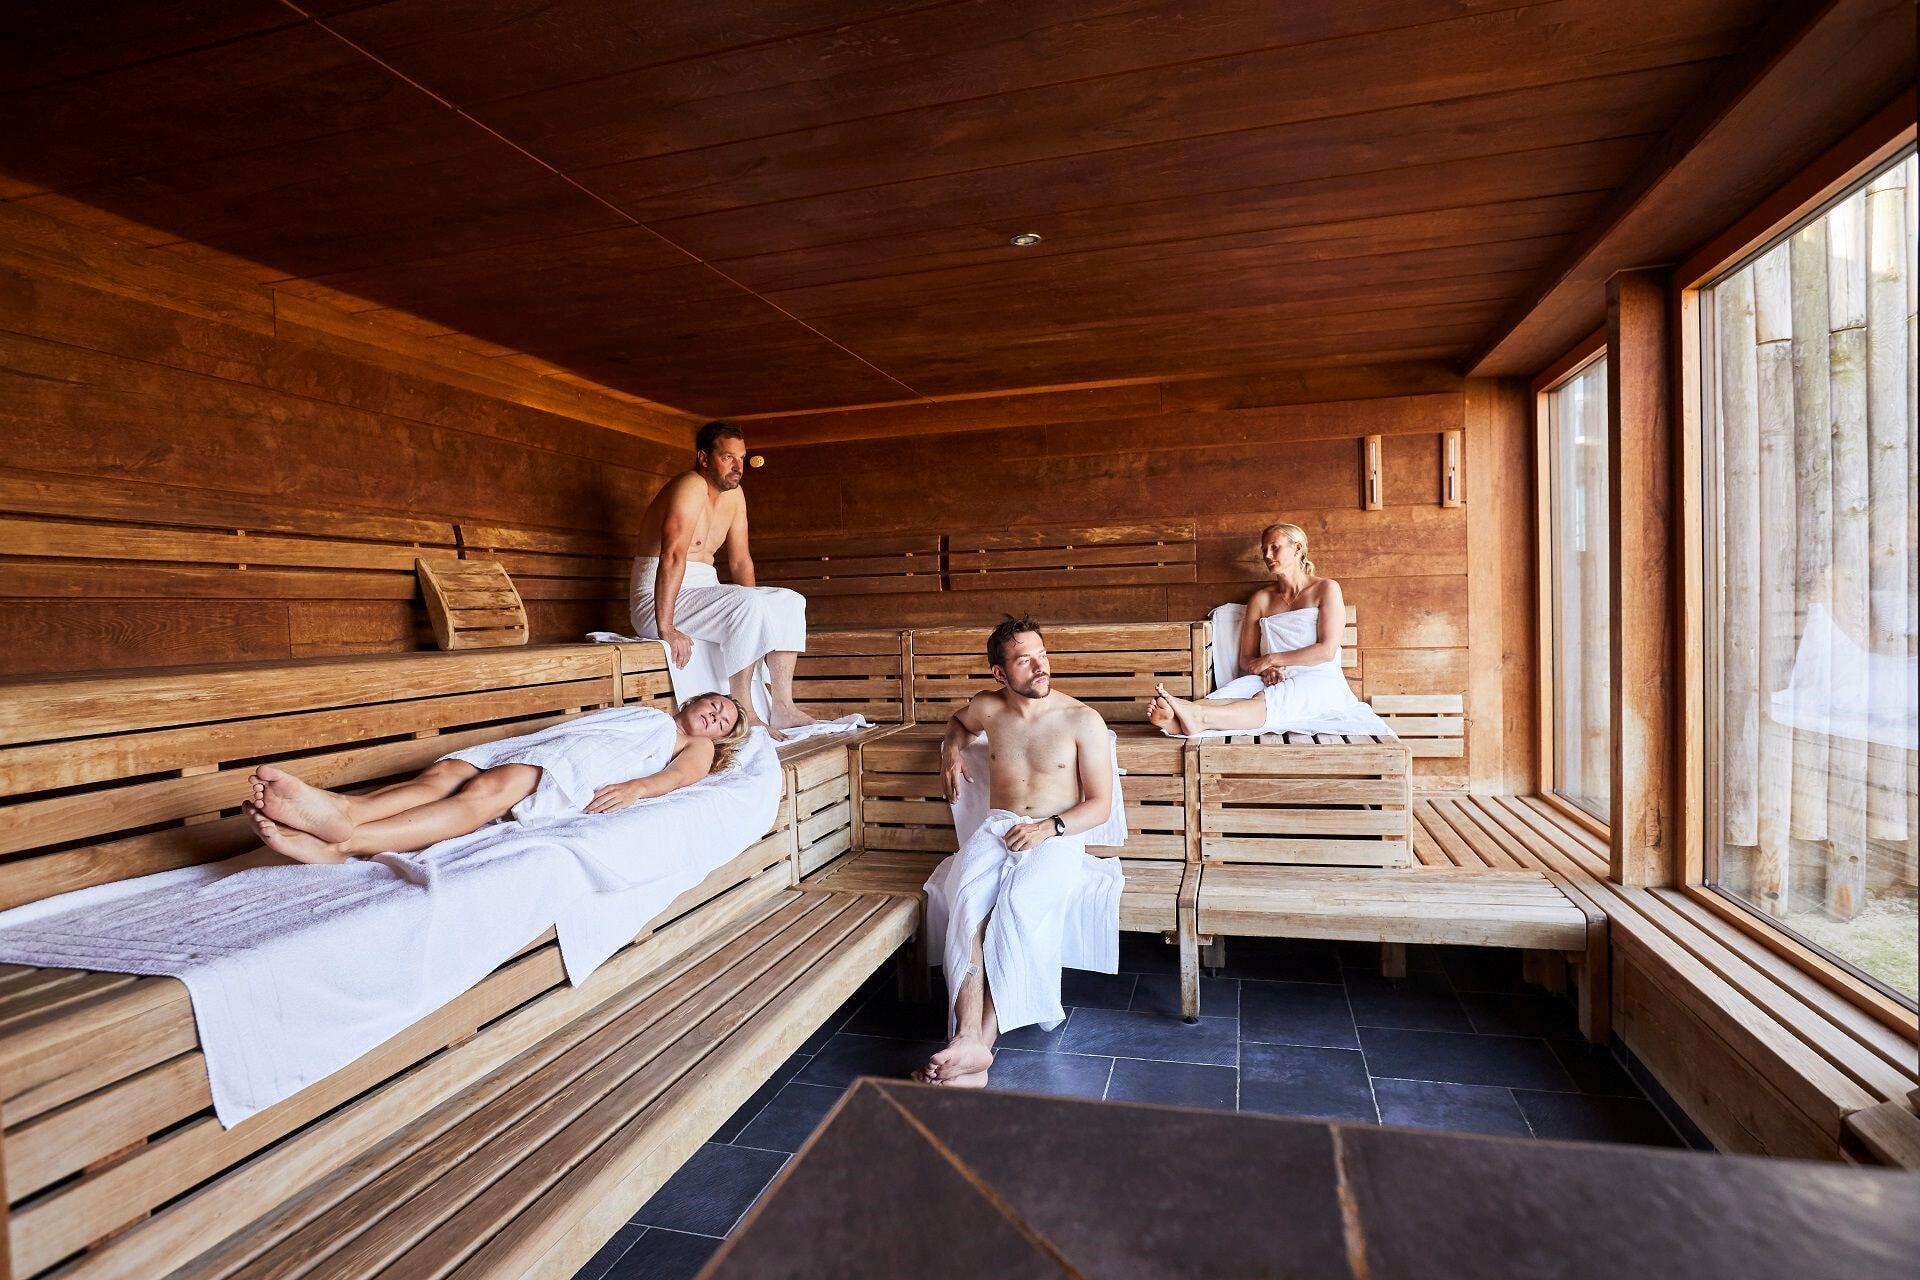 Sylterwelle Sauna